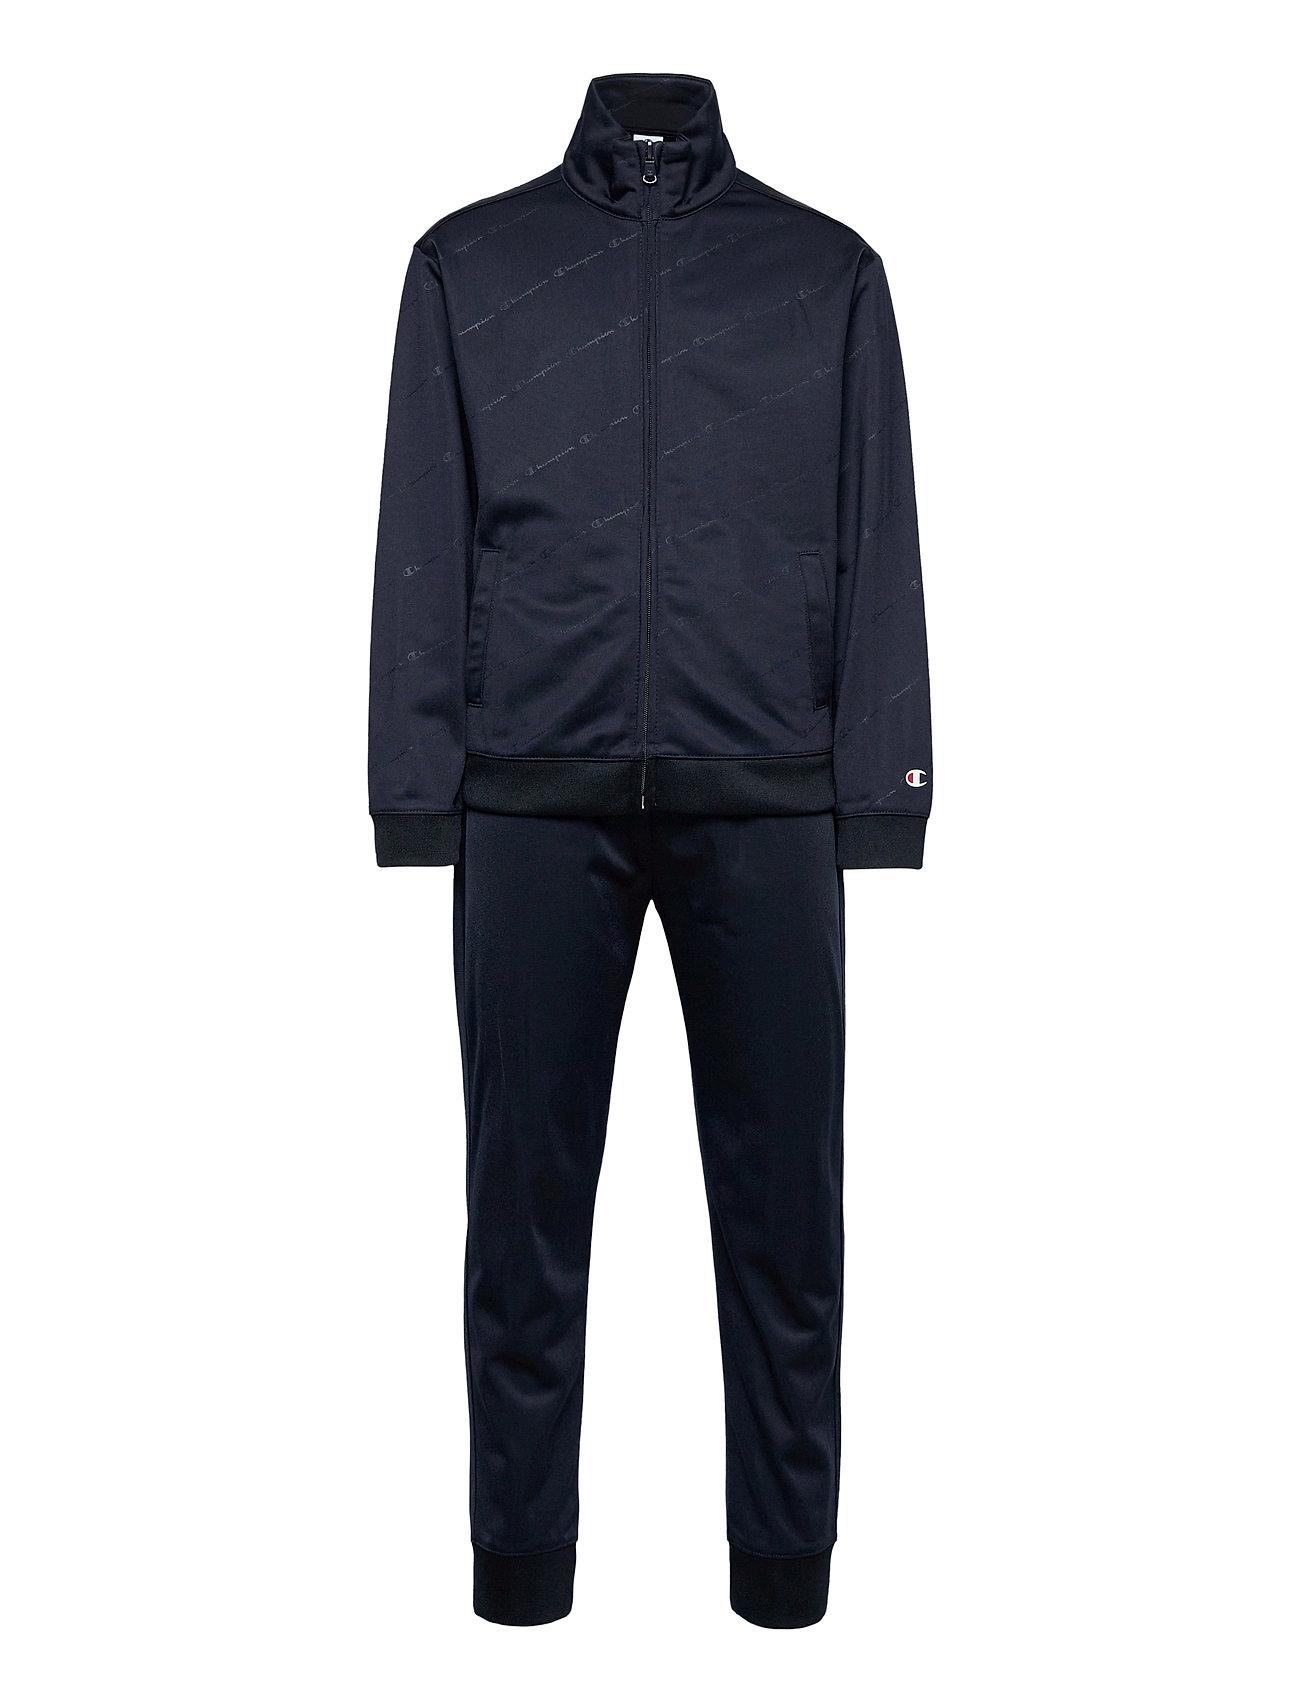 Image of Full Zip Suit Tracksuit Blå Champion (3462446211)